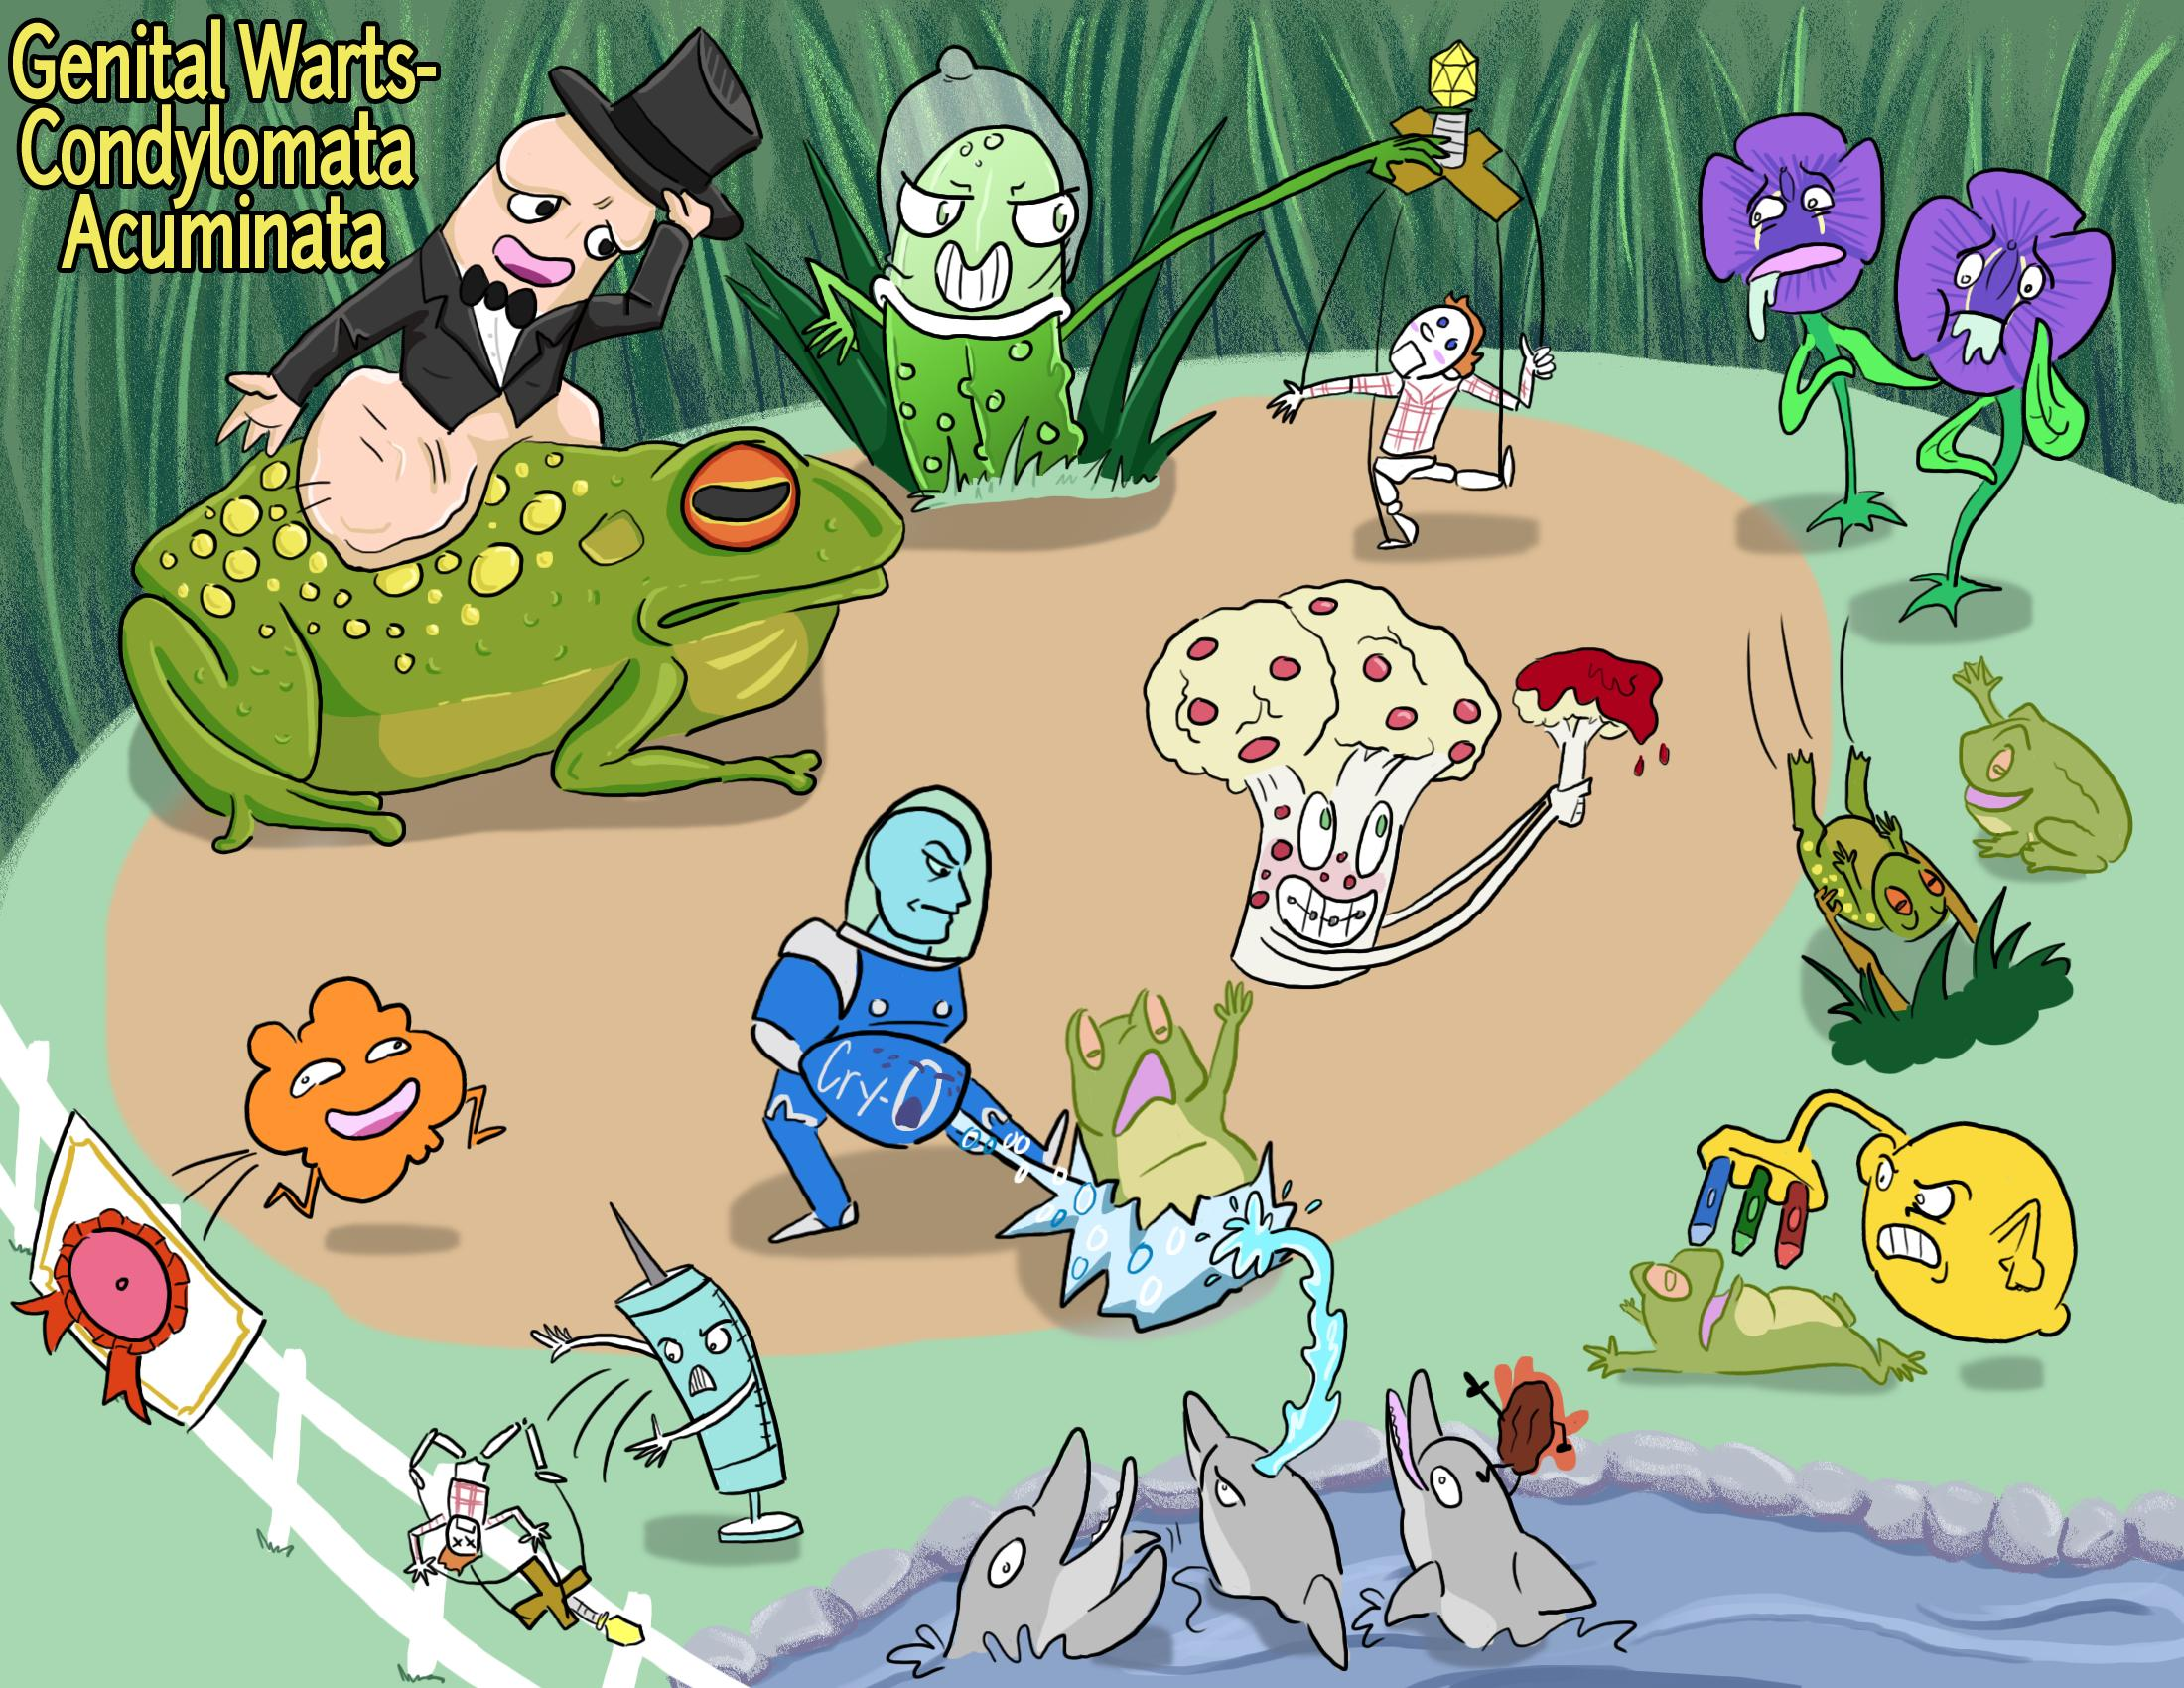 Genital Warts - Condylomata Acuminata